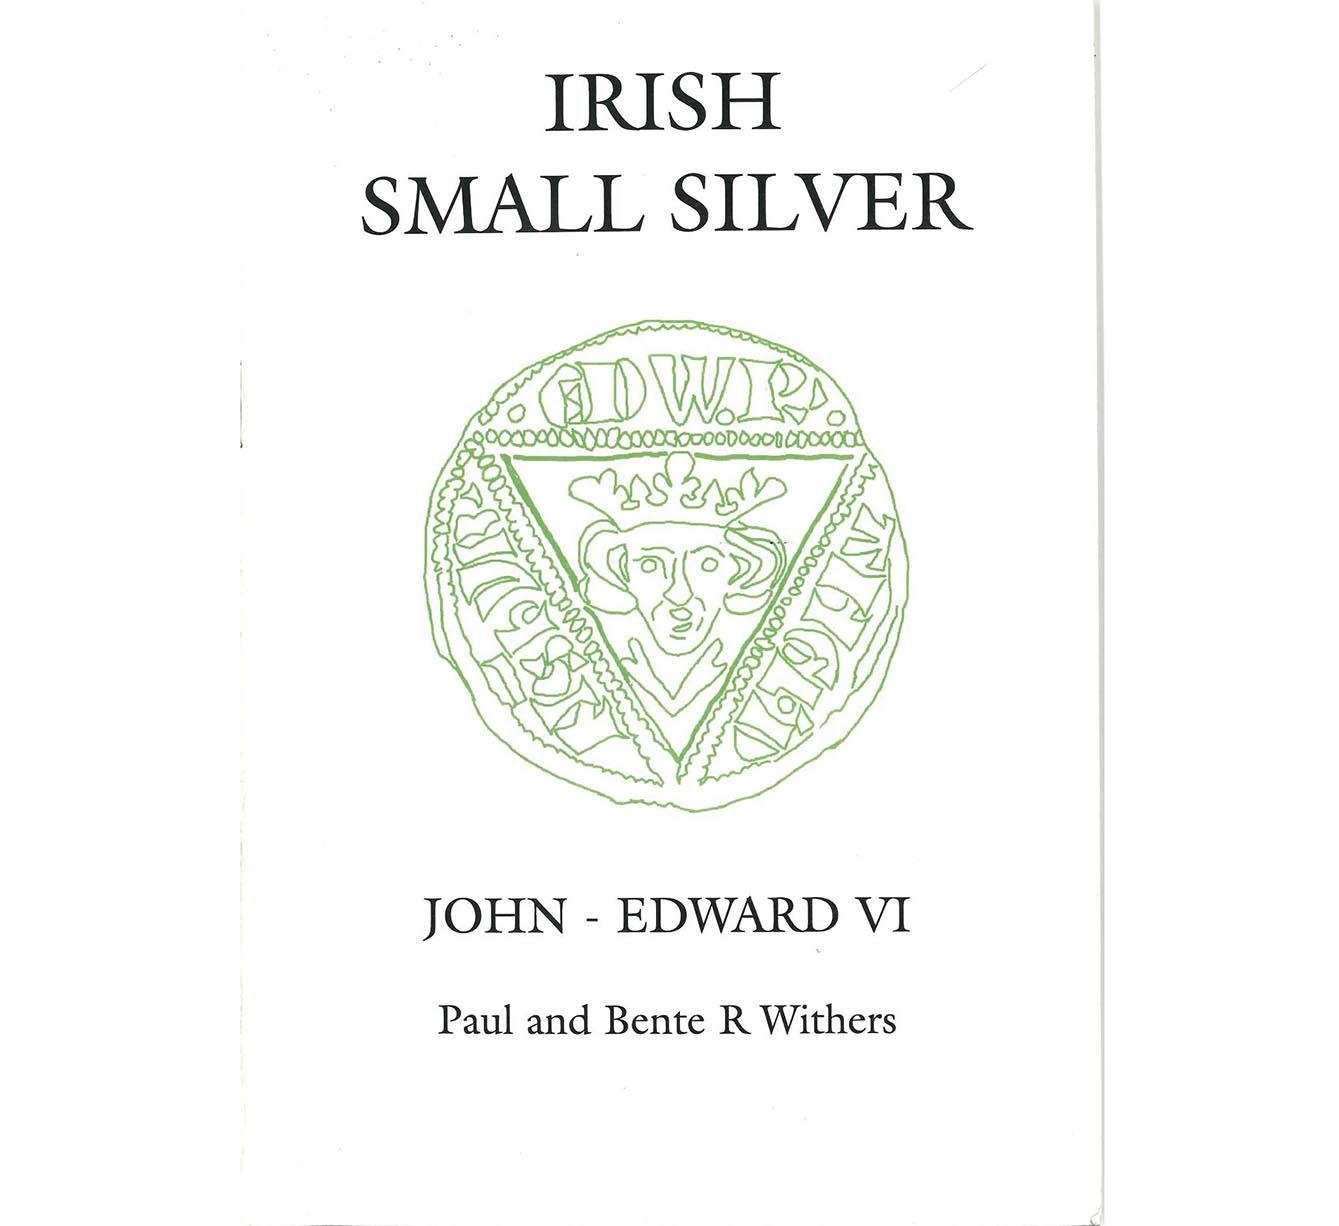 Irish Small Silver of John - Edward VI